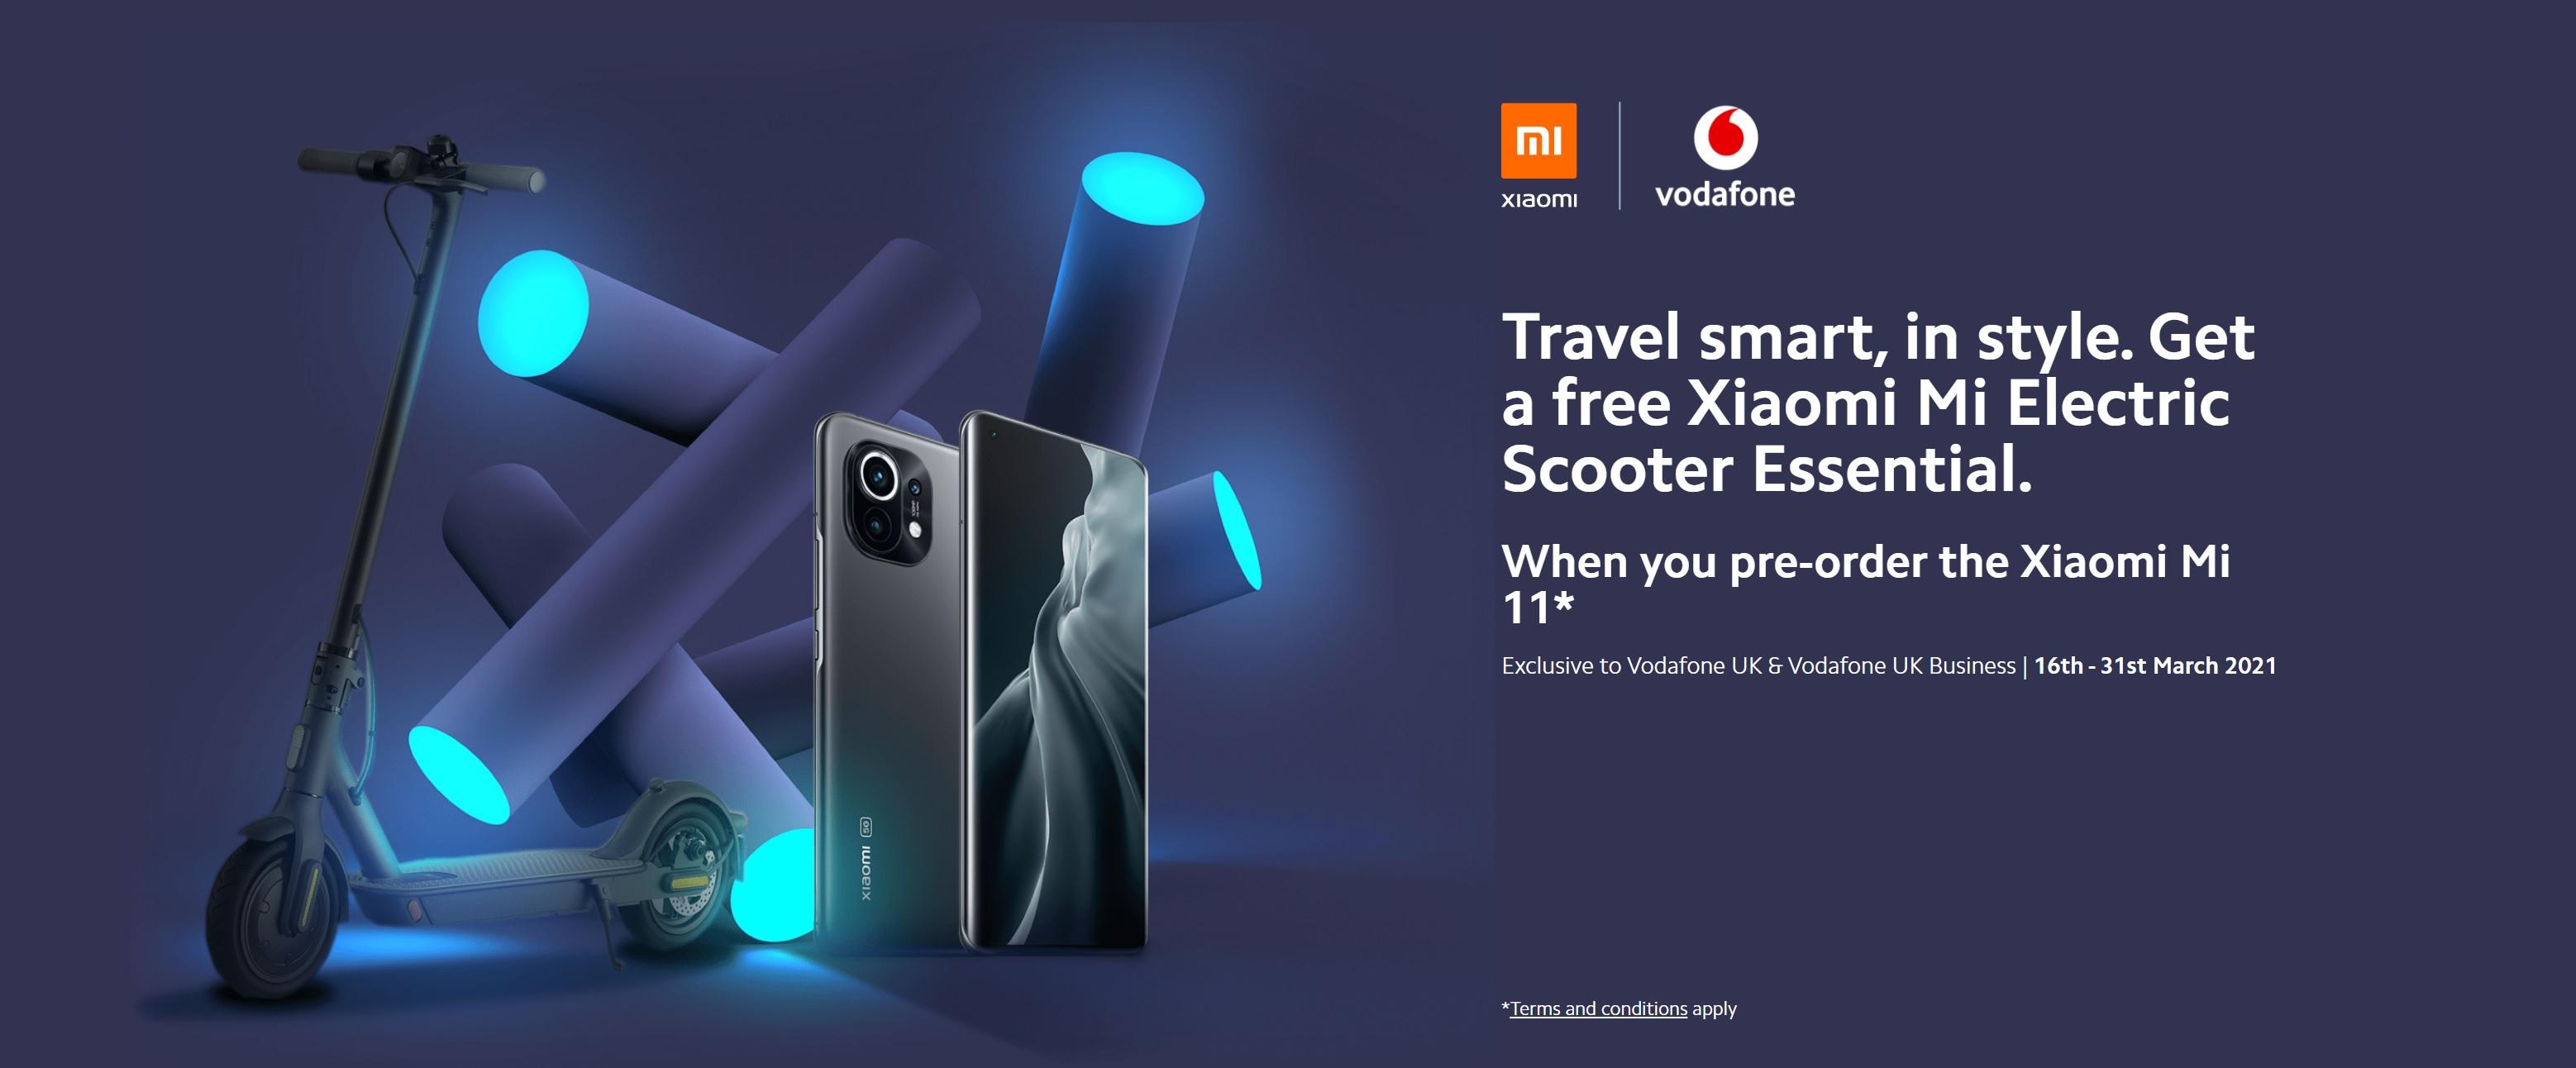 Free Mi Electric Scooter with Xiaomi Mi 11 Deals